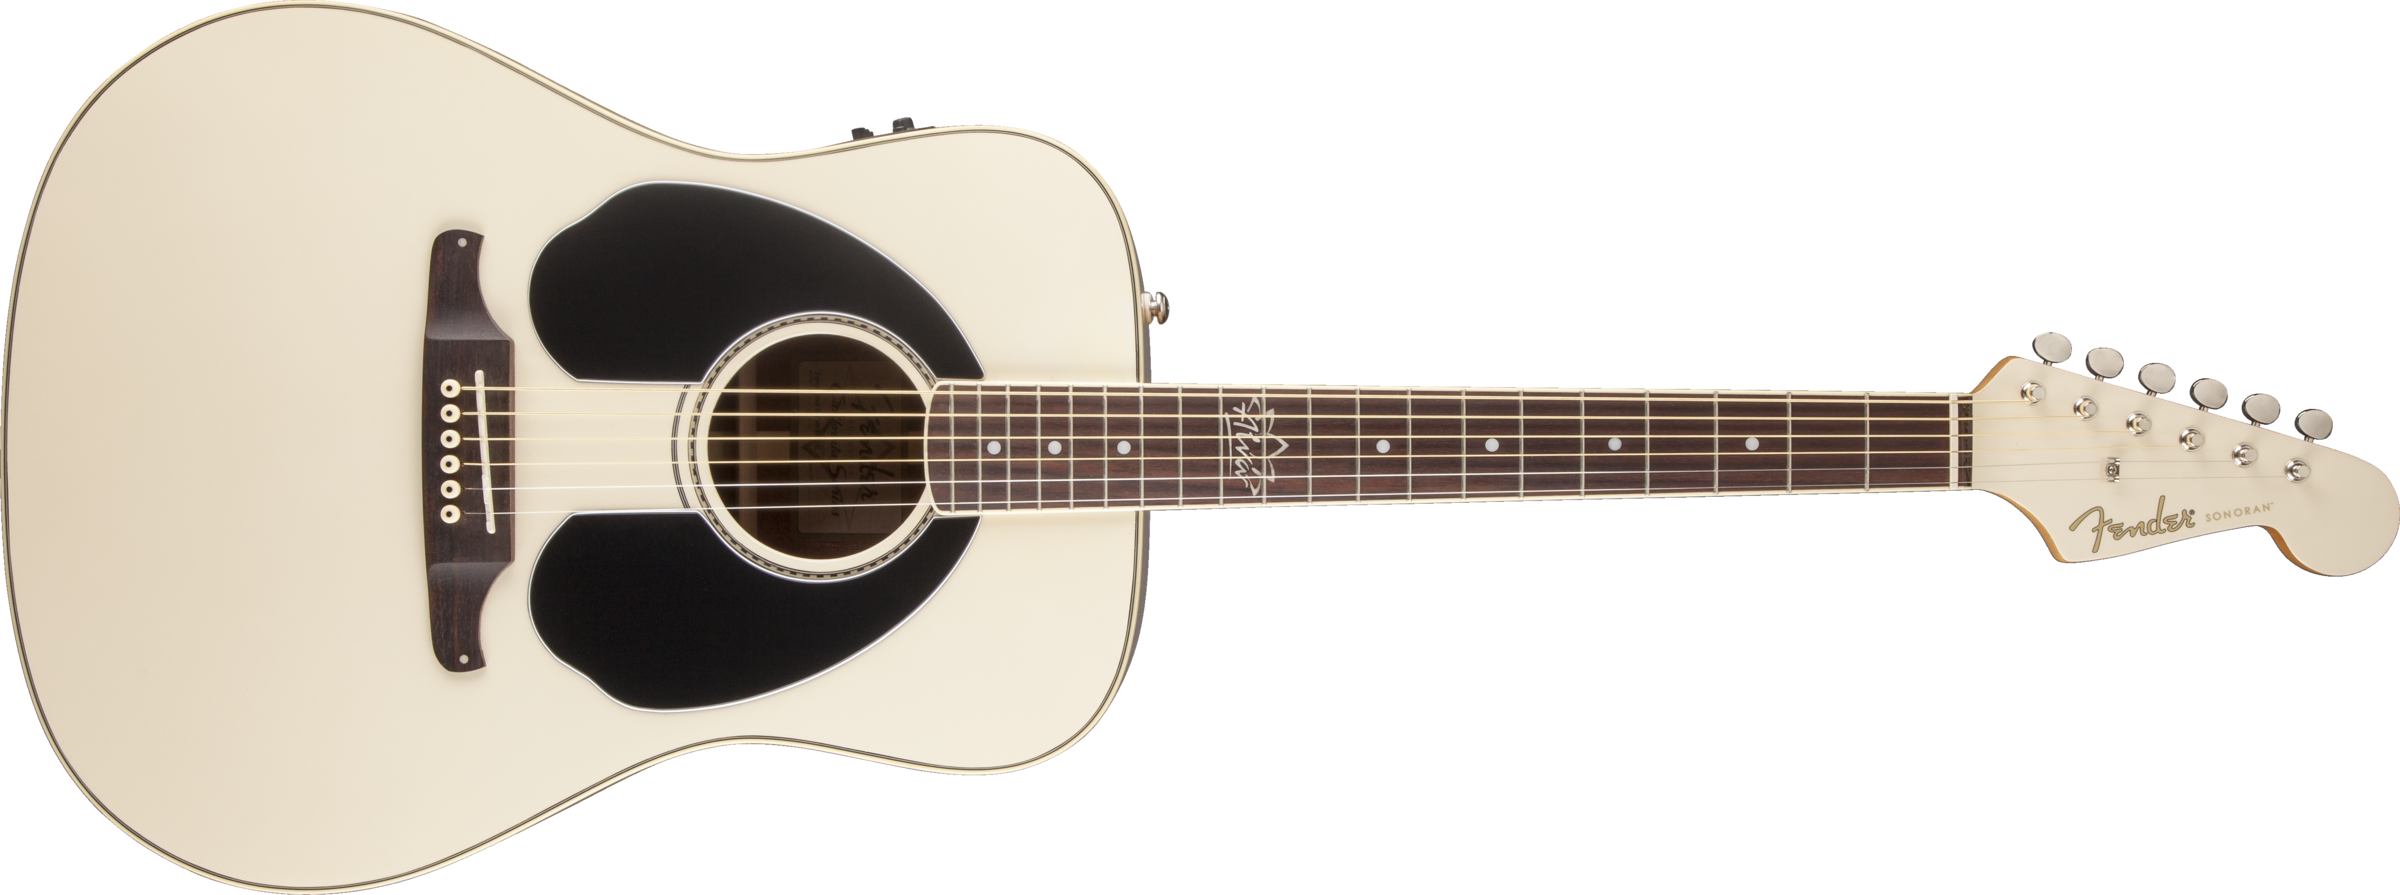 Need Tony Alva Sonoran Sce Artist Design Series Fender Fender Guitars Fender Acoustic Guitar